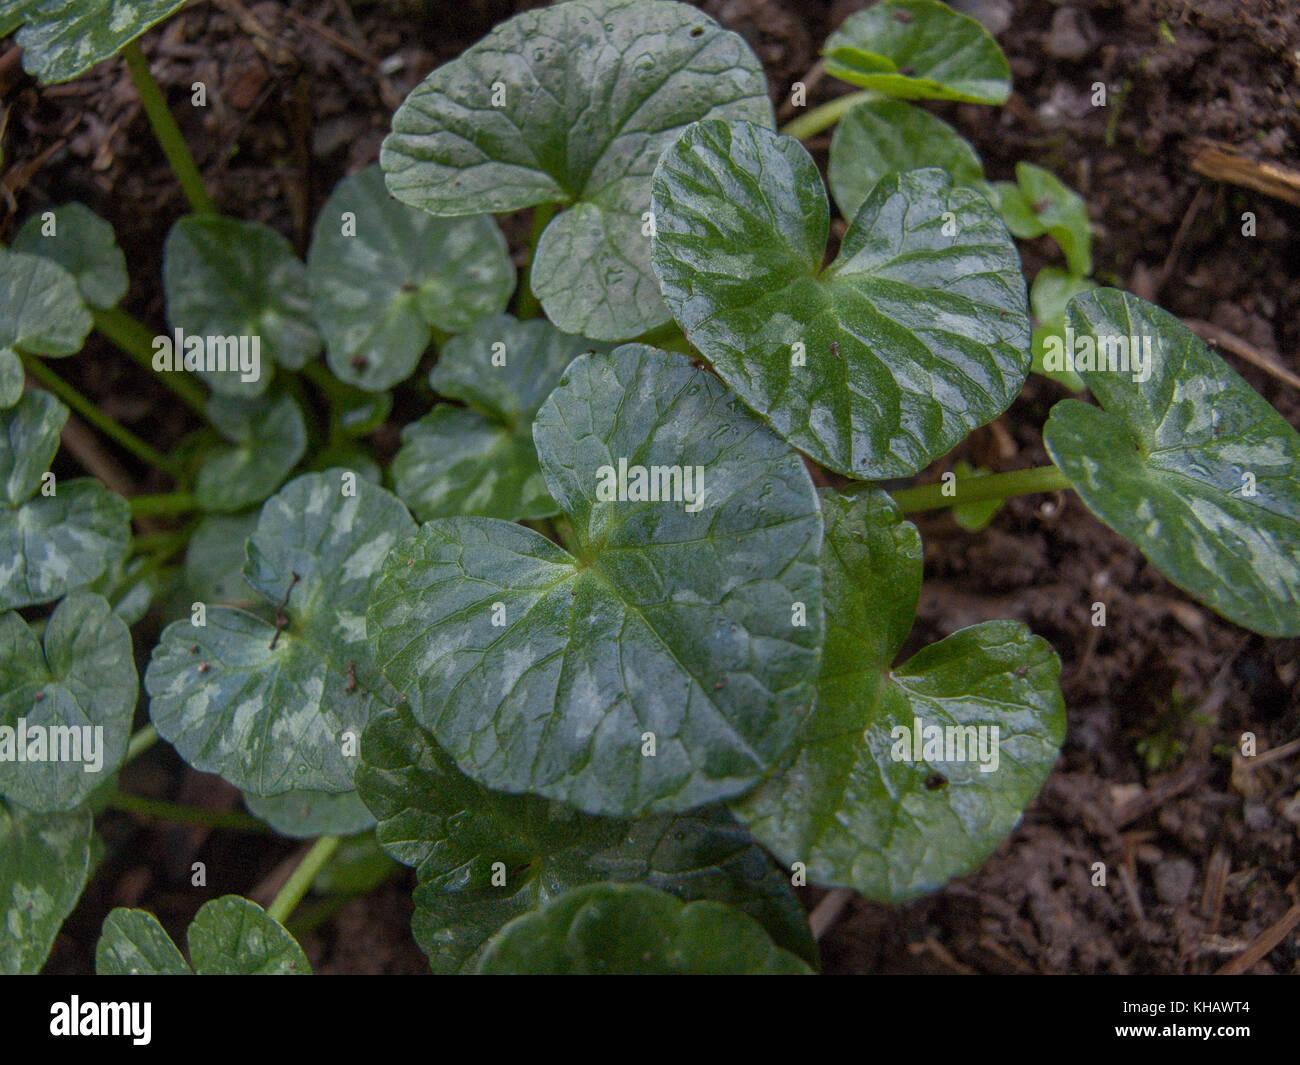 Leaves of Lesser Celandine (Ranunculus ficaria). - Stock Image